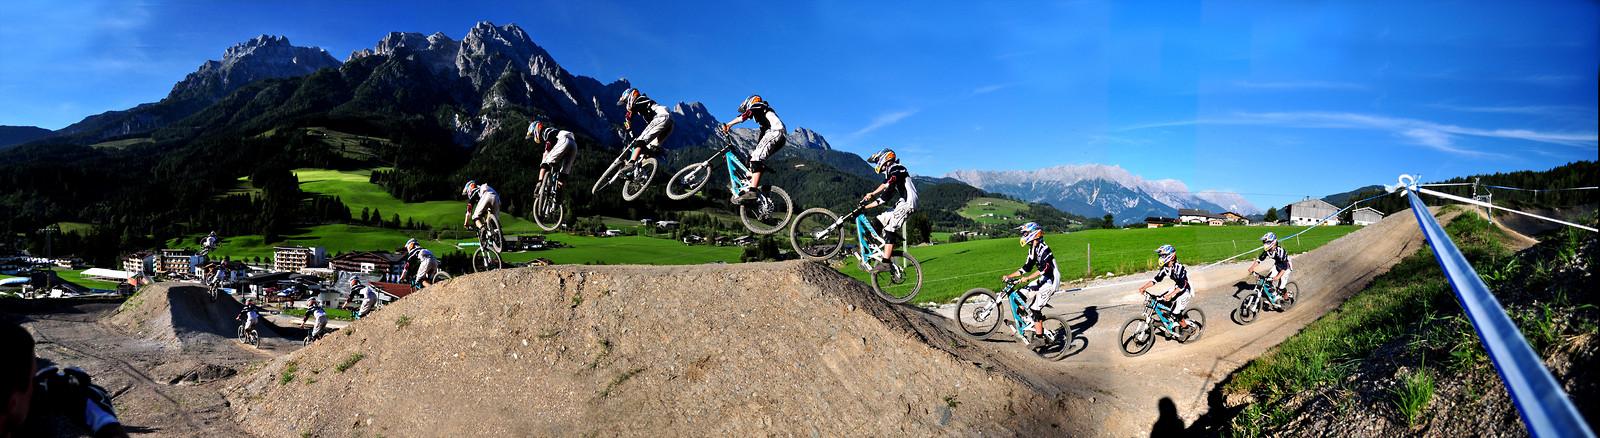 Dirt Line - sillykid74 - Mountain Biking Pictures - Vital MTB